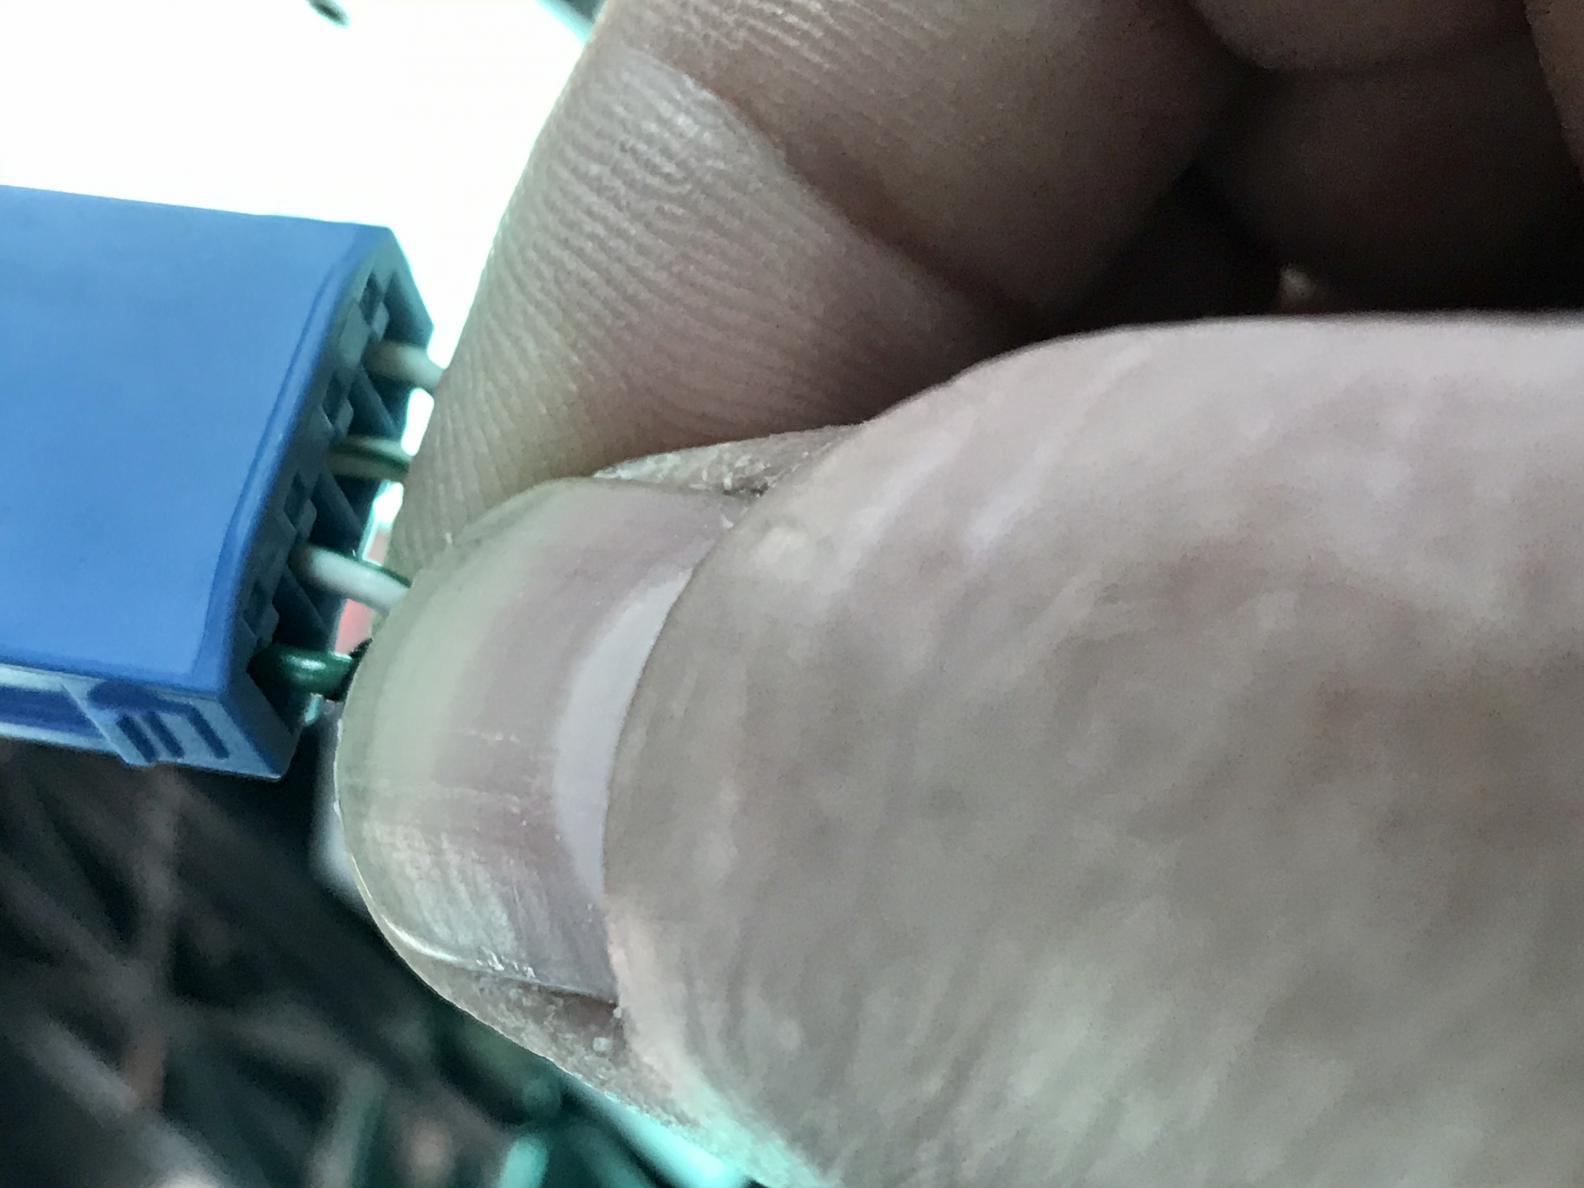 Button/Switch back light wires-cbc2877c-a21d-46e7-a0c4-5c0dc85bf85a-jpg